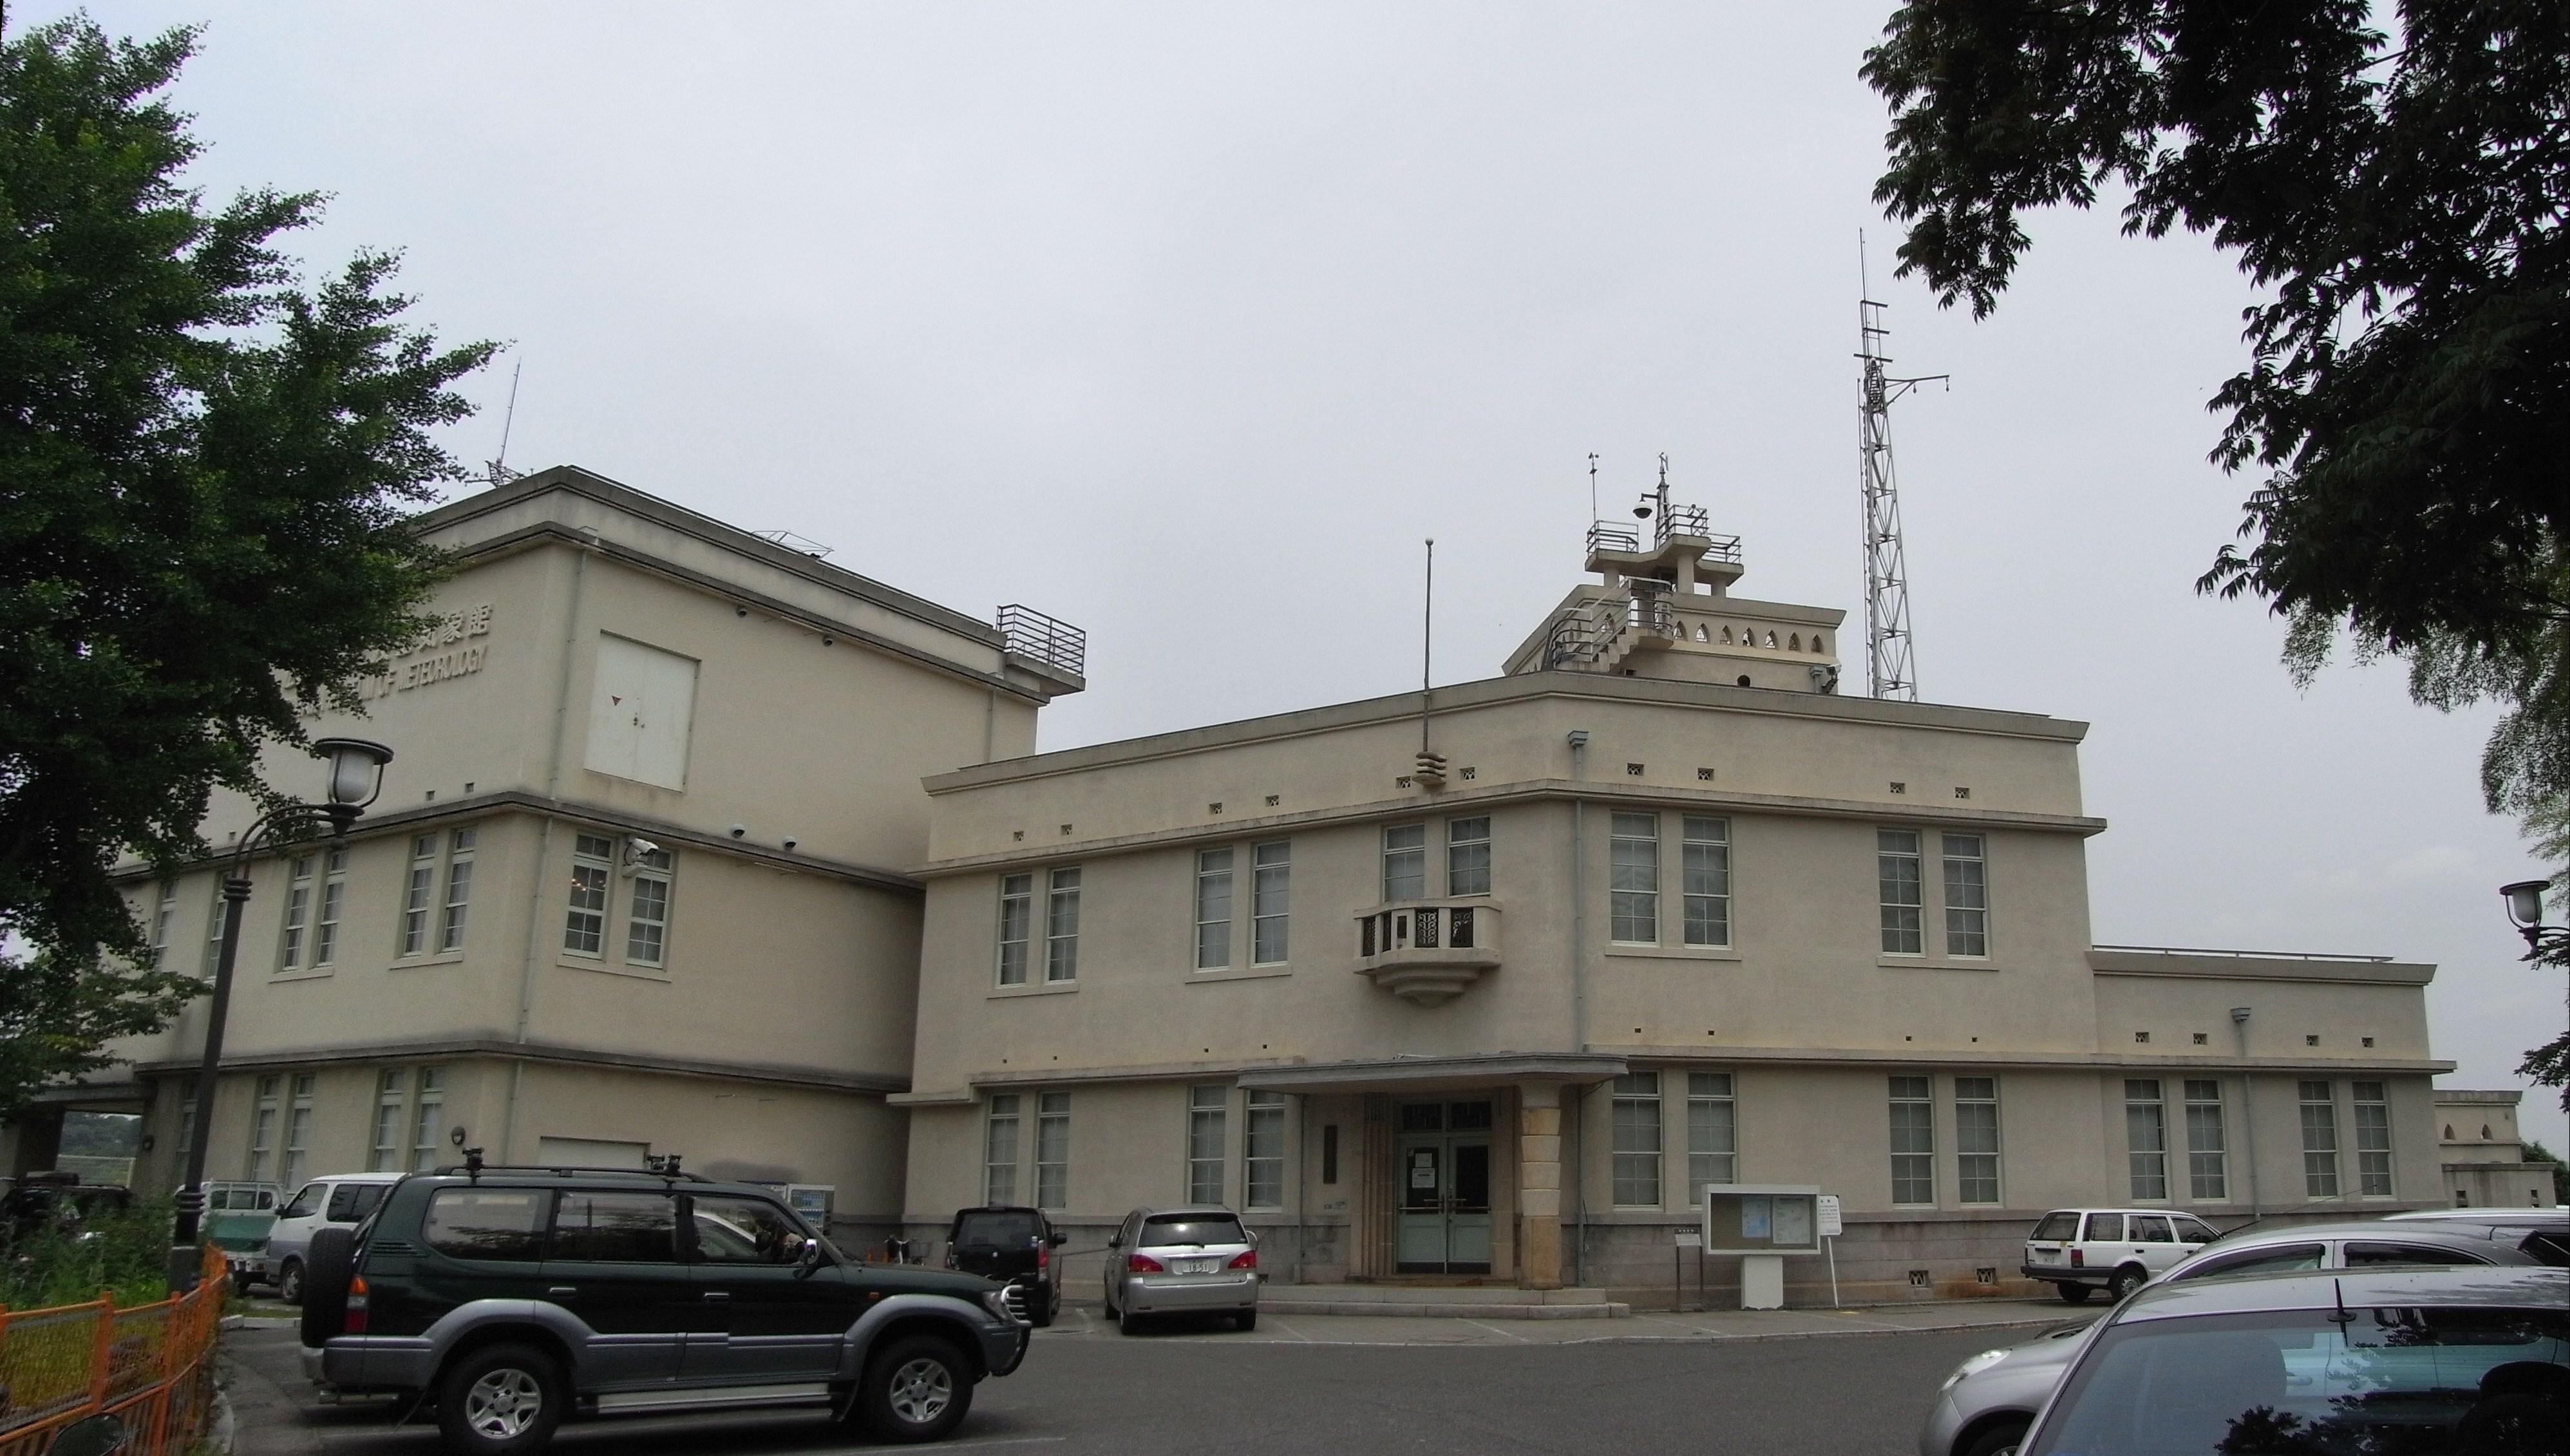 https://upload.wikimedia.org/wikipedia/commons/1/1f/Hiroshima_City_Ebayama_Museum_of_Meteorology_2.jpg